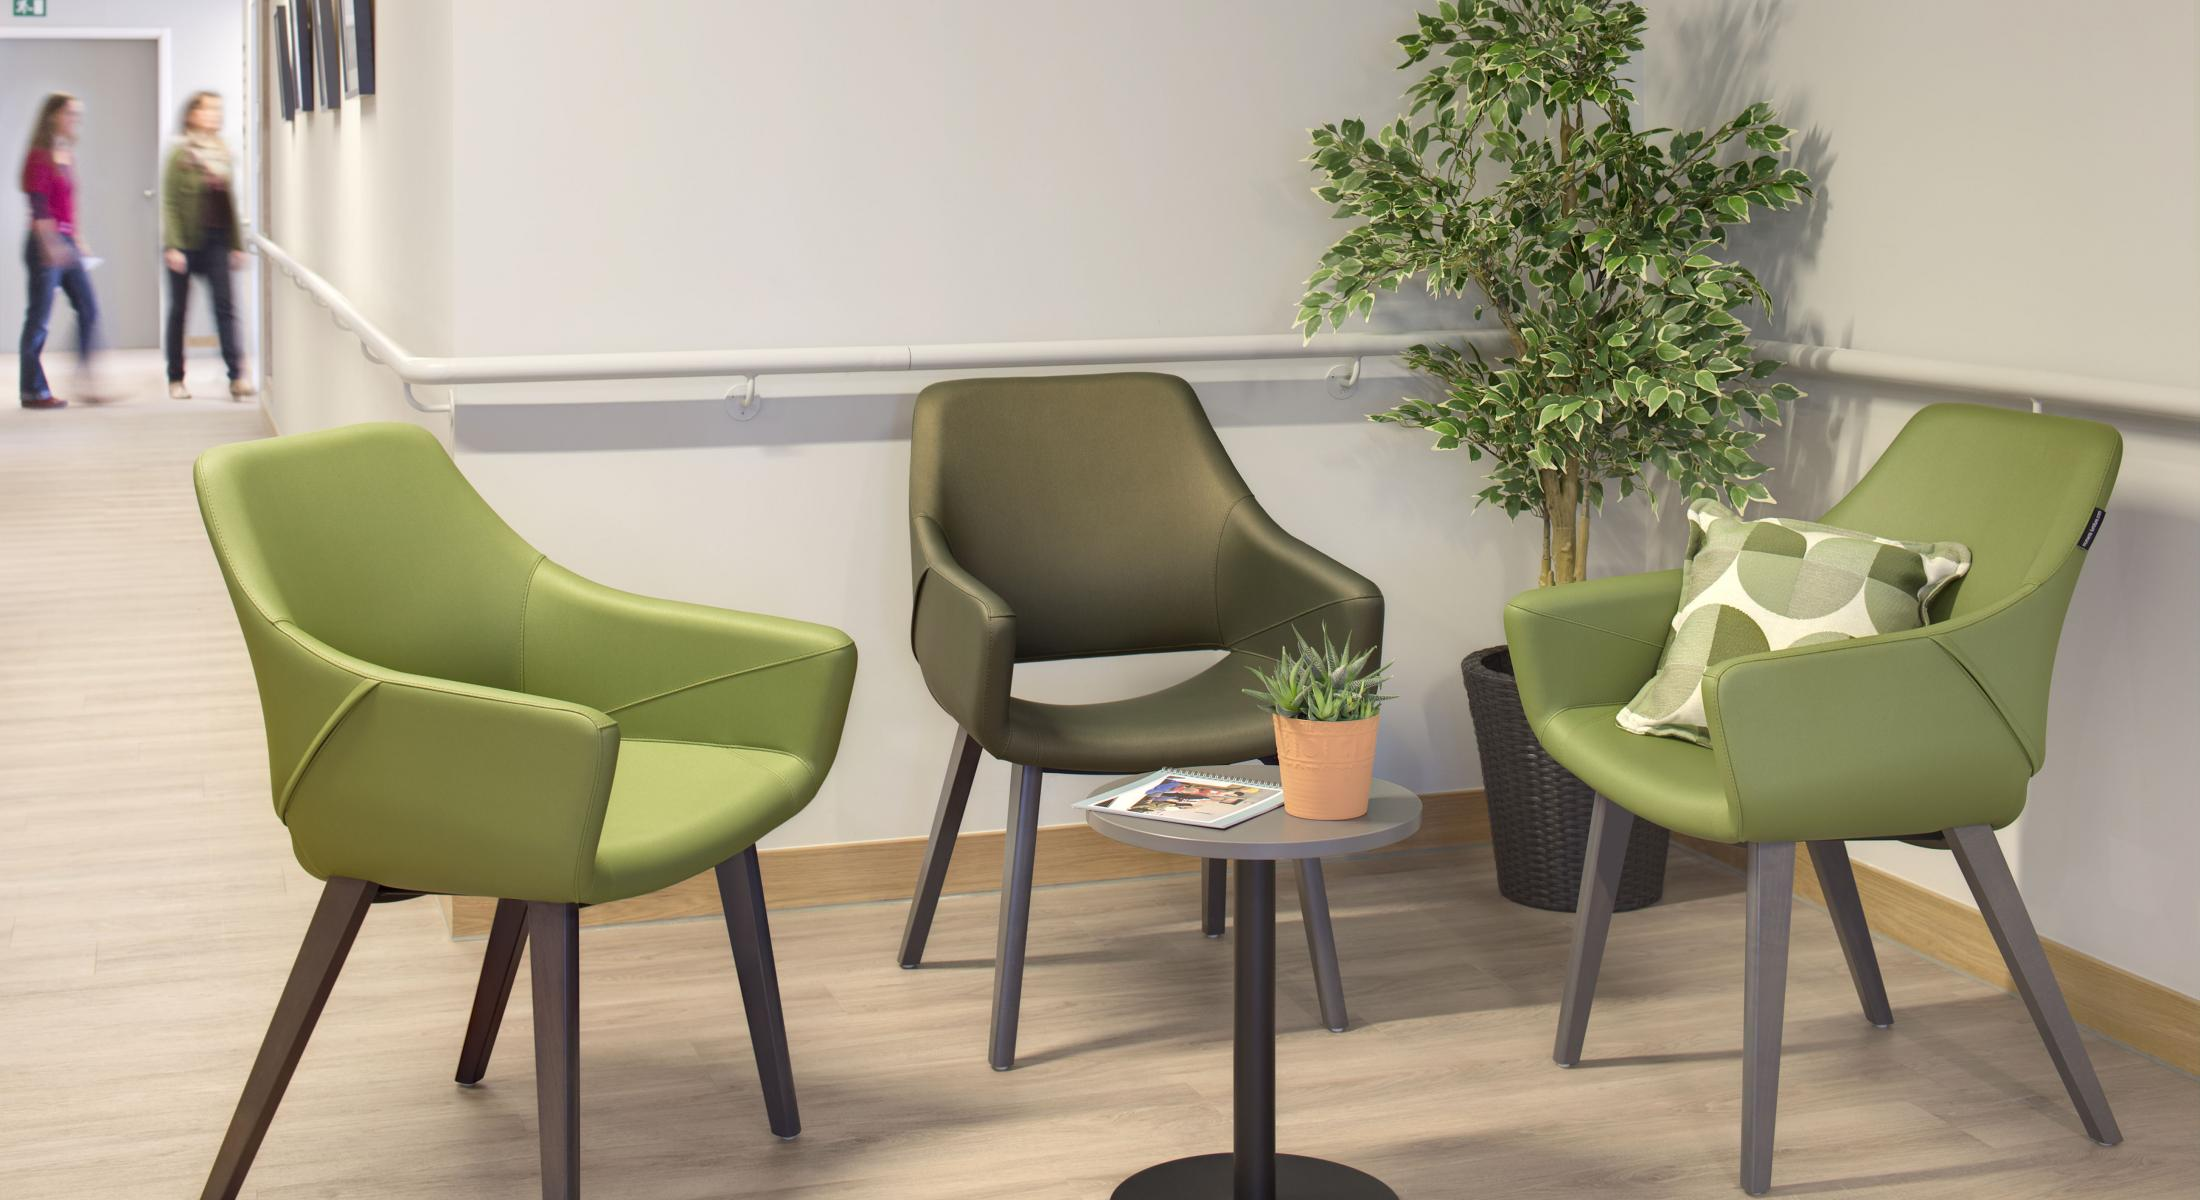 Creating Hospitality - WZC Keyhof Huldenberg 2 - moments furniture